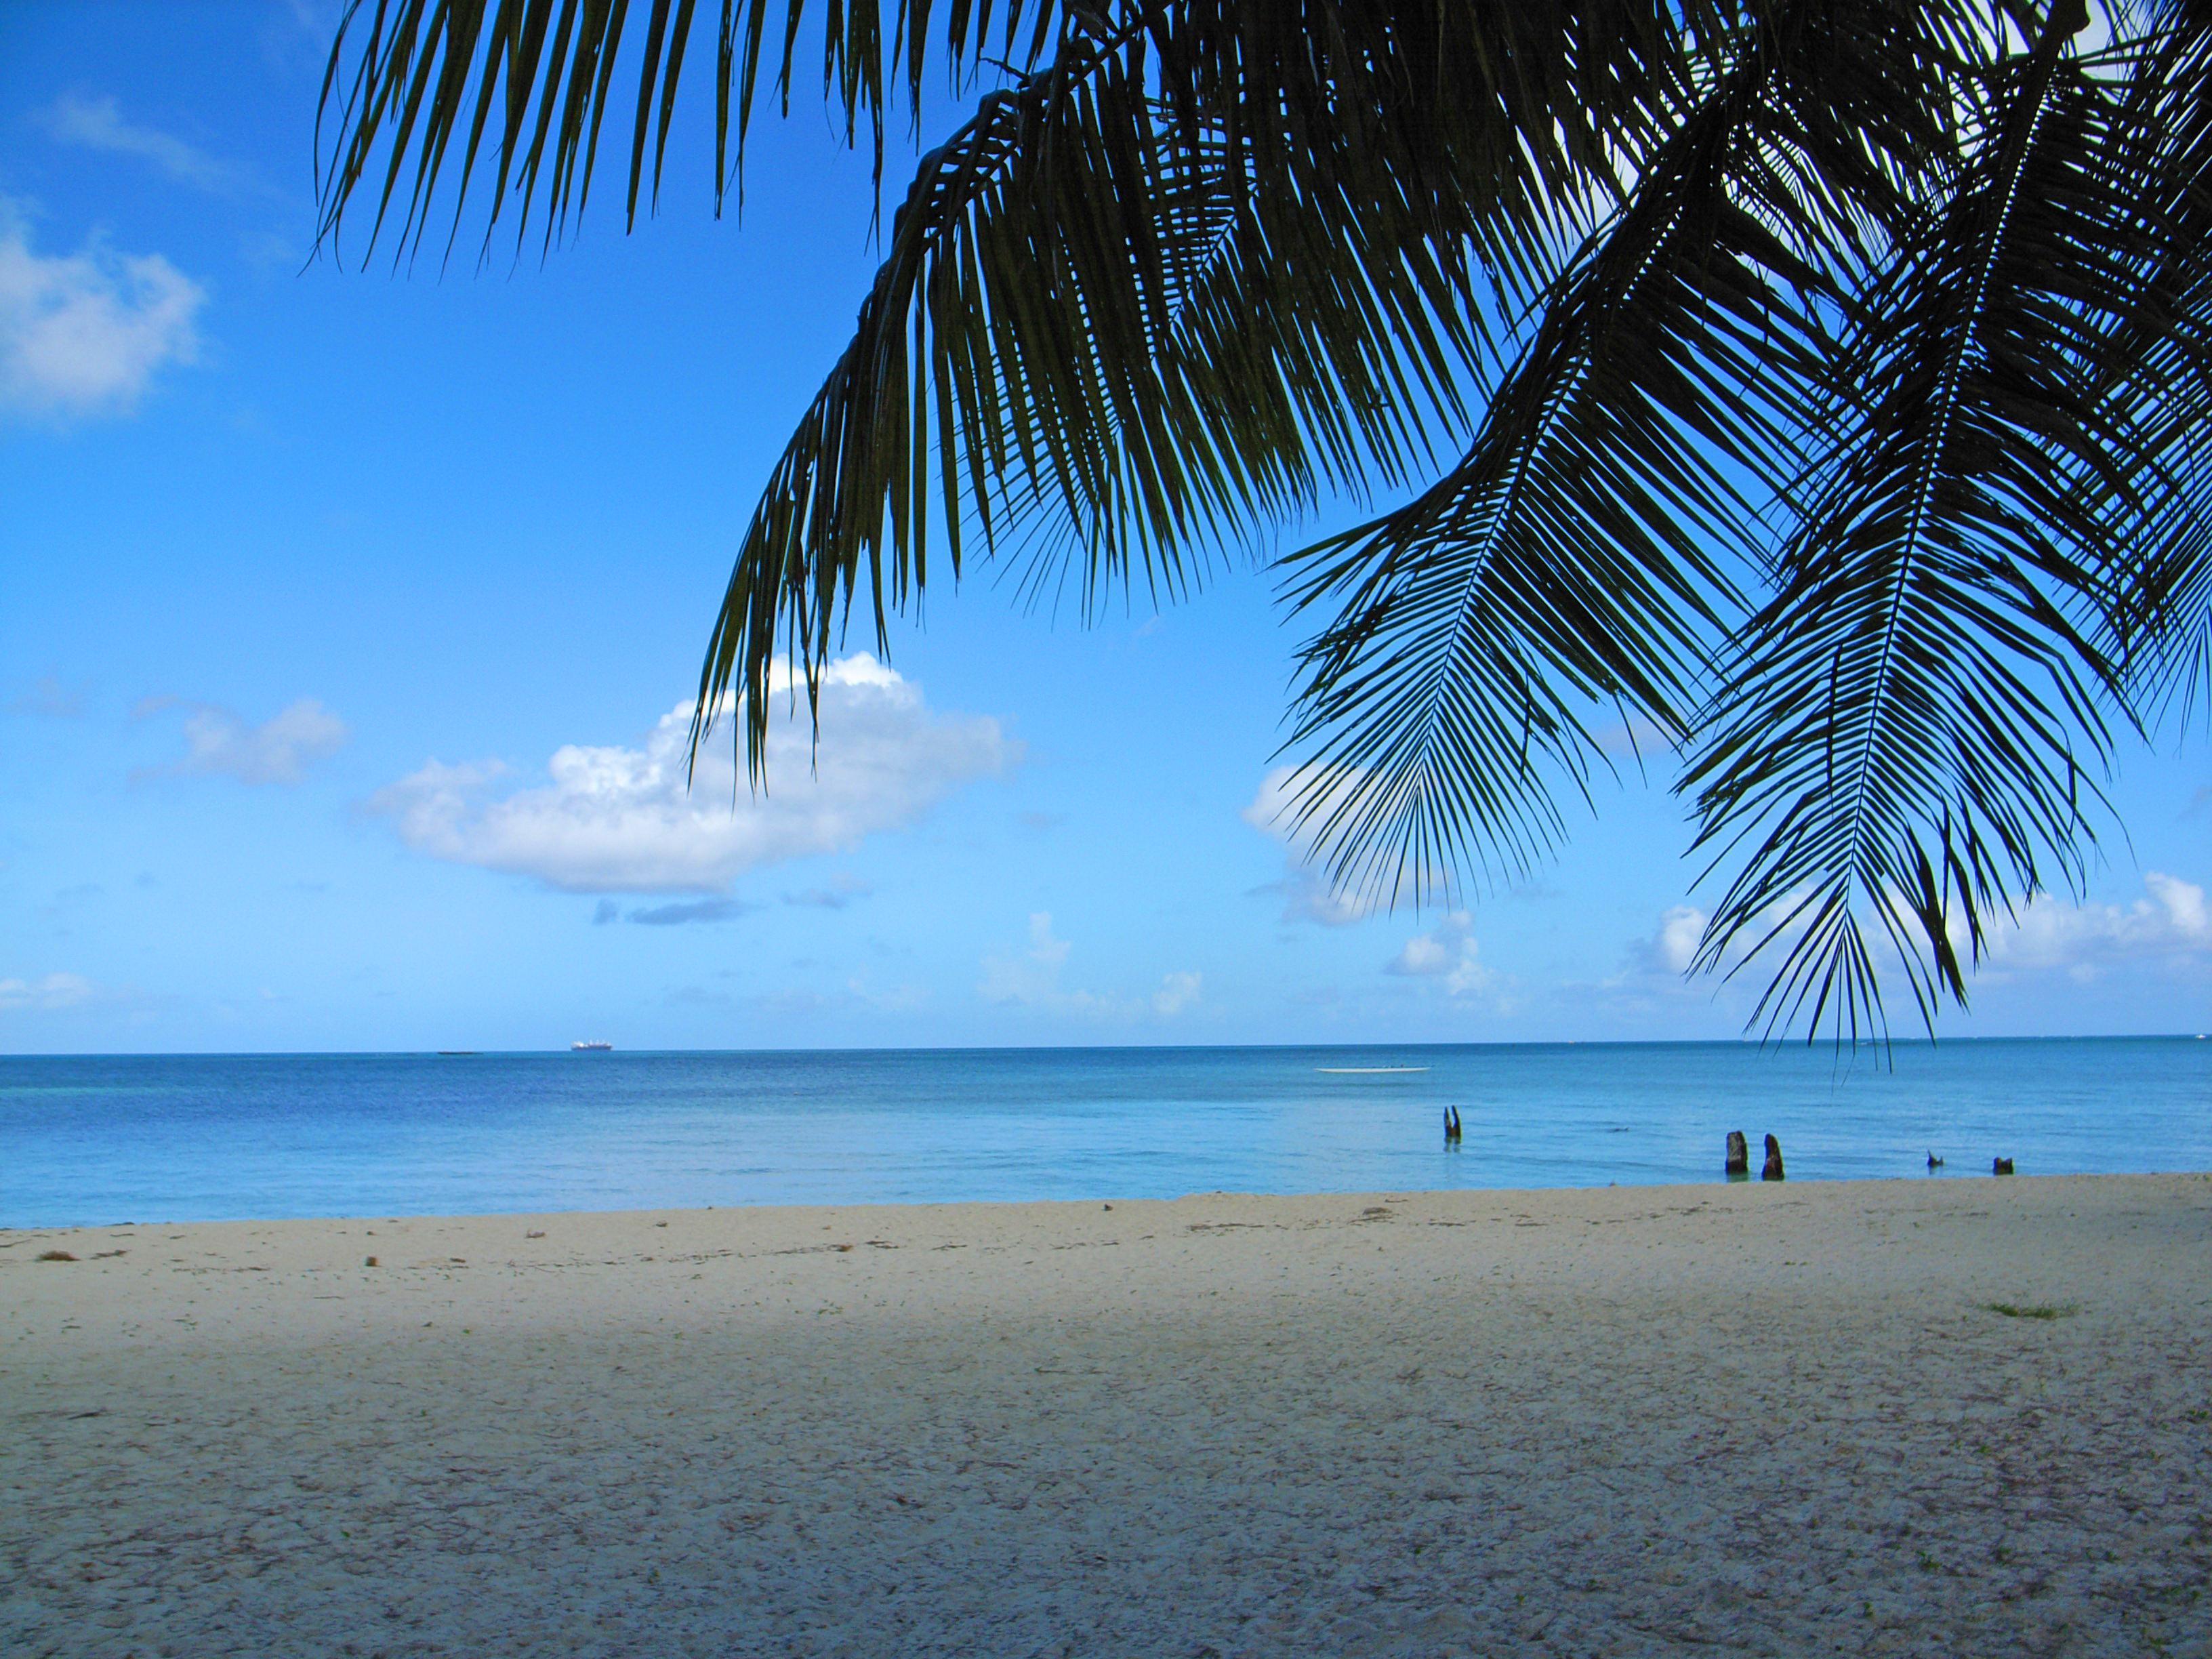 Http Commons Wikimedia Org Wiki File Micro Beach 530316786 Jpg